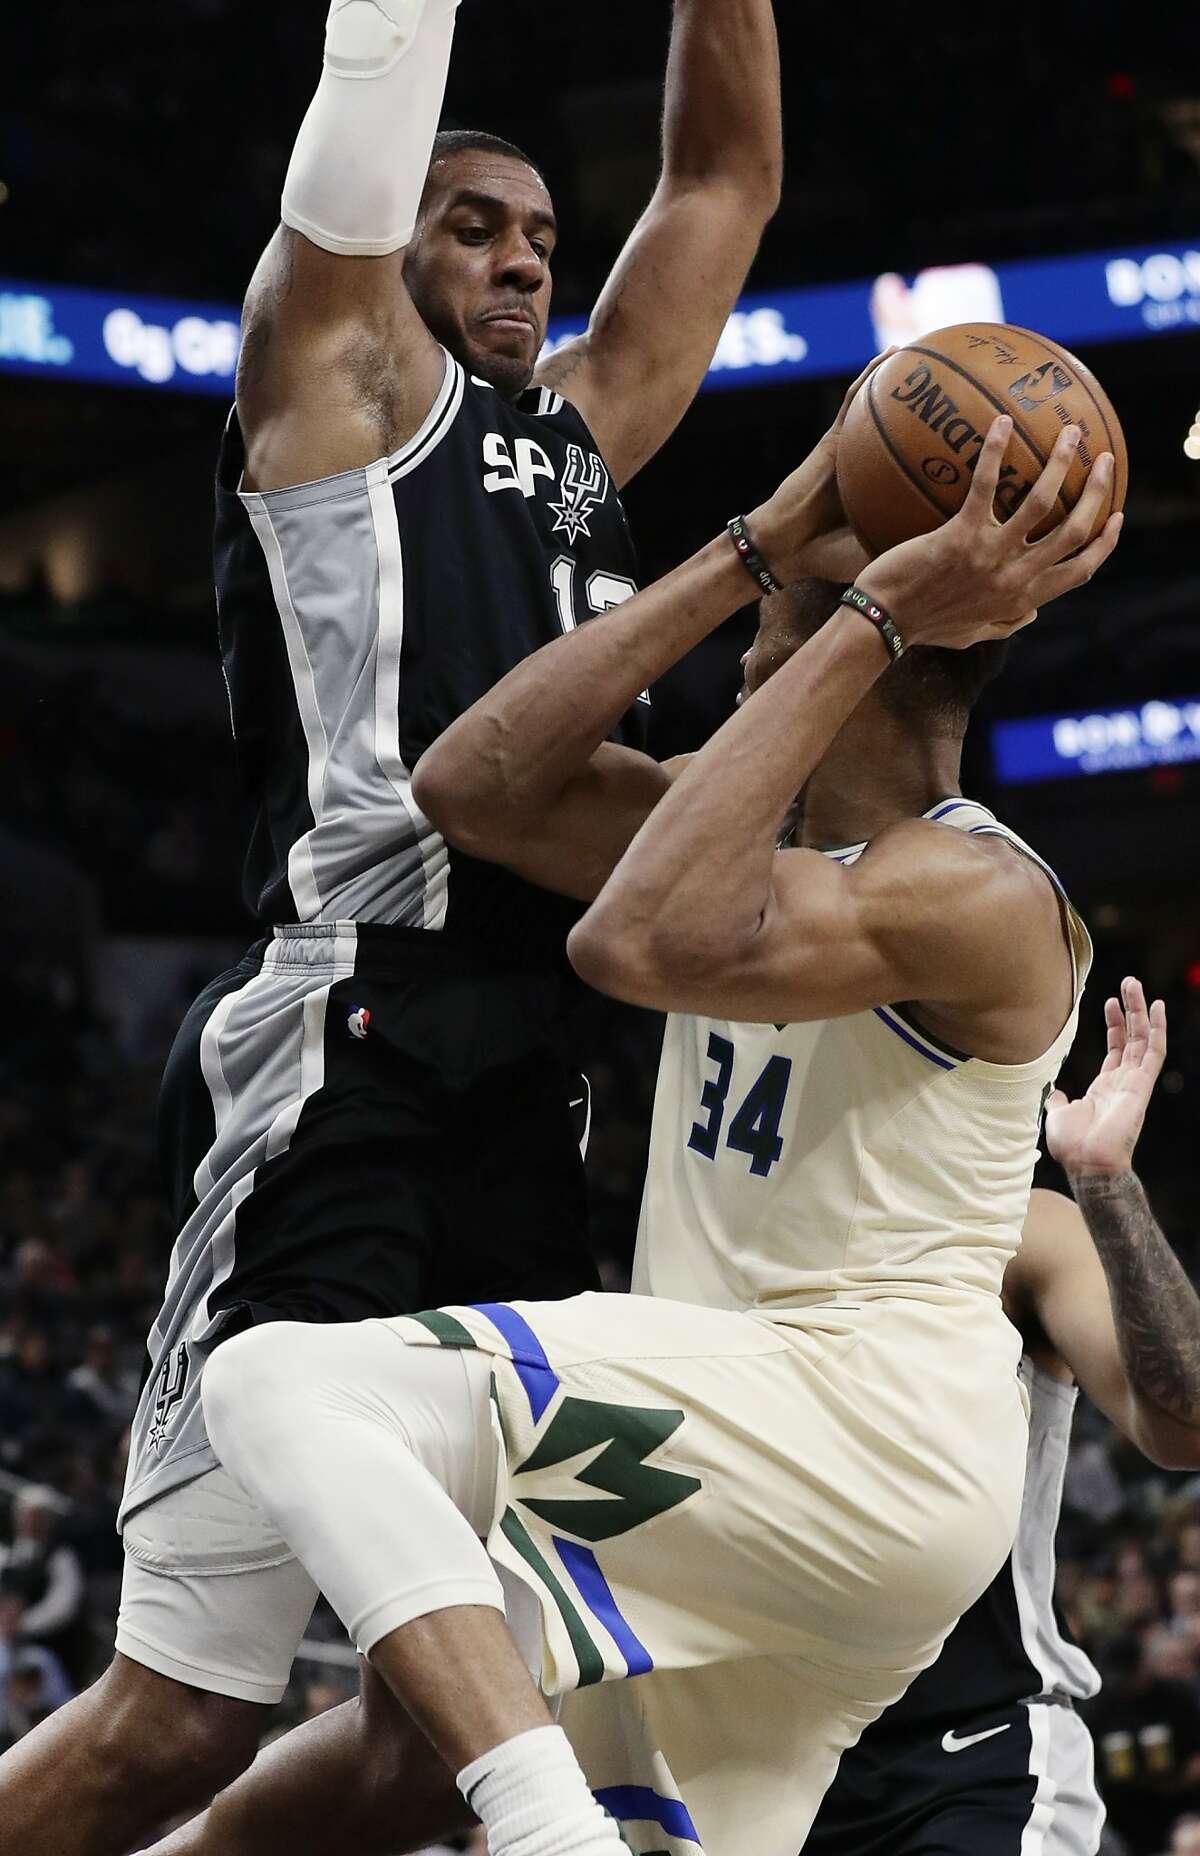 San Antonio Spurs center LaMarcus Aldridge (12) pressures Milwaukee Bucks forward Giannis Antetokounmpo (34) during the second half of an NBA basketball game, in San Antonio, Monday, Jan. 6, 2020. (AP Photo/Eric Gay)